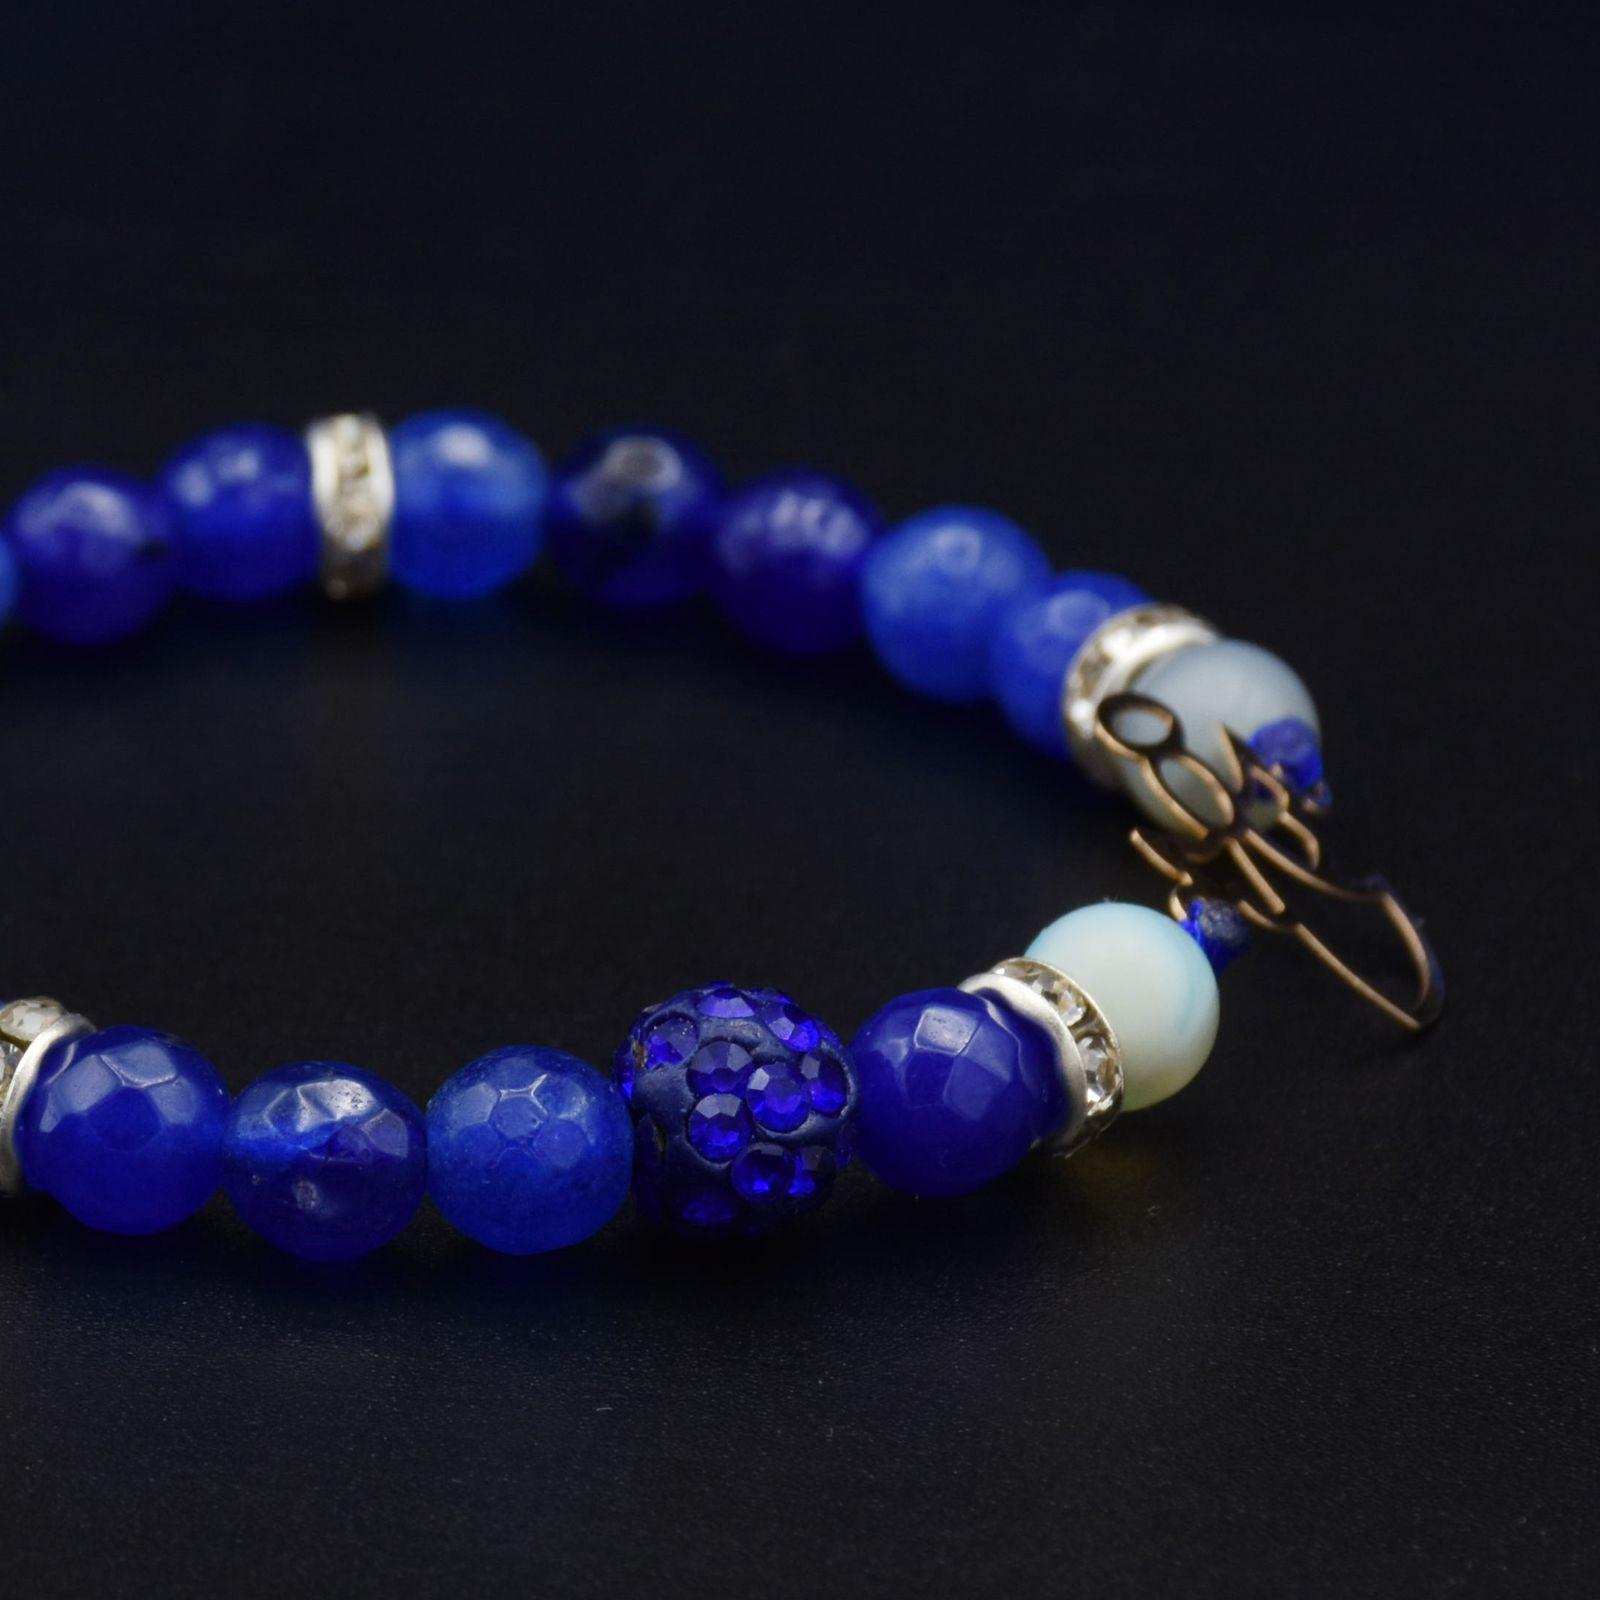 دستبند طلا 18 عیار زنانه آمانژ طرح فرشته کد 945D8898 -  - 3